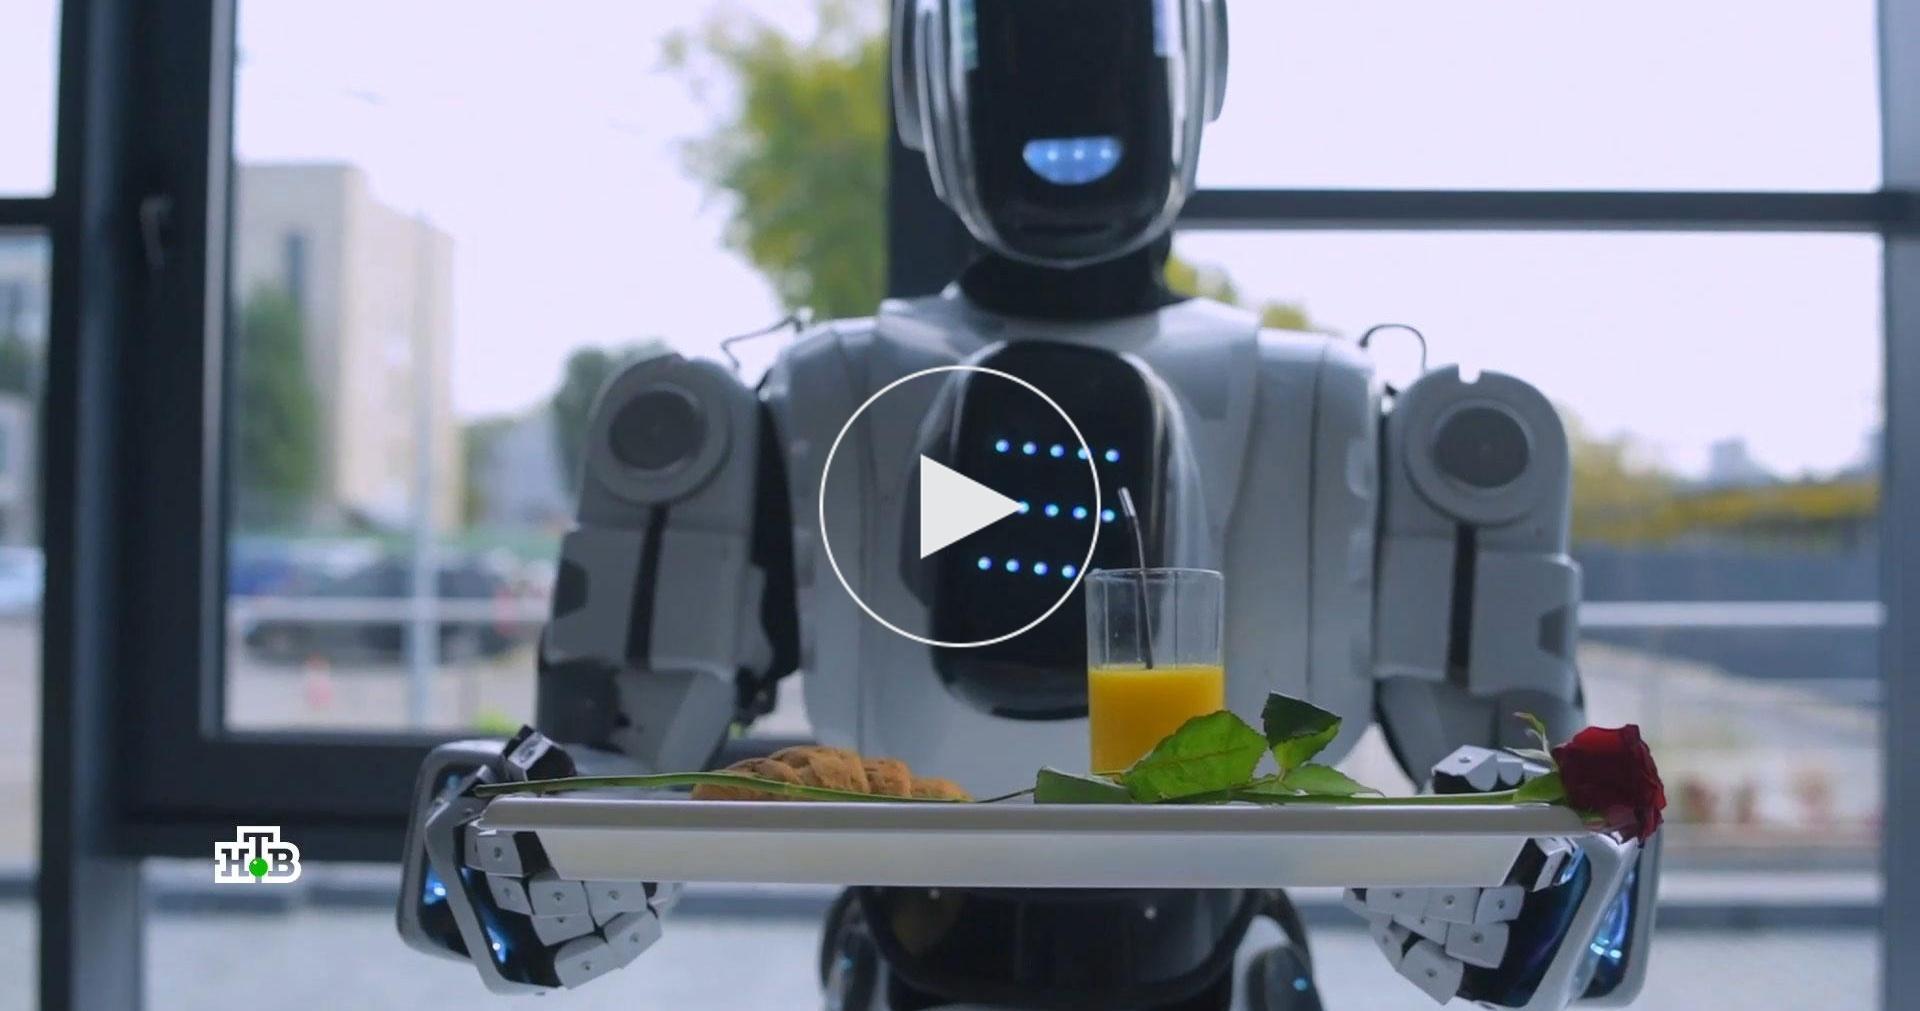 Сервис будущего: роботехника на службе уресторанов